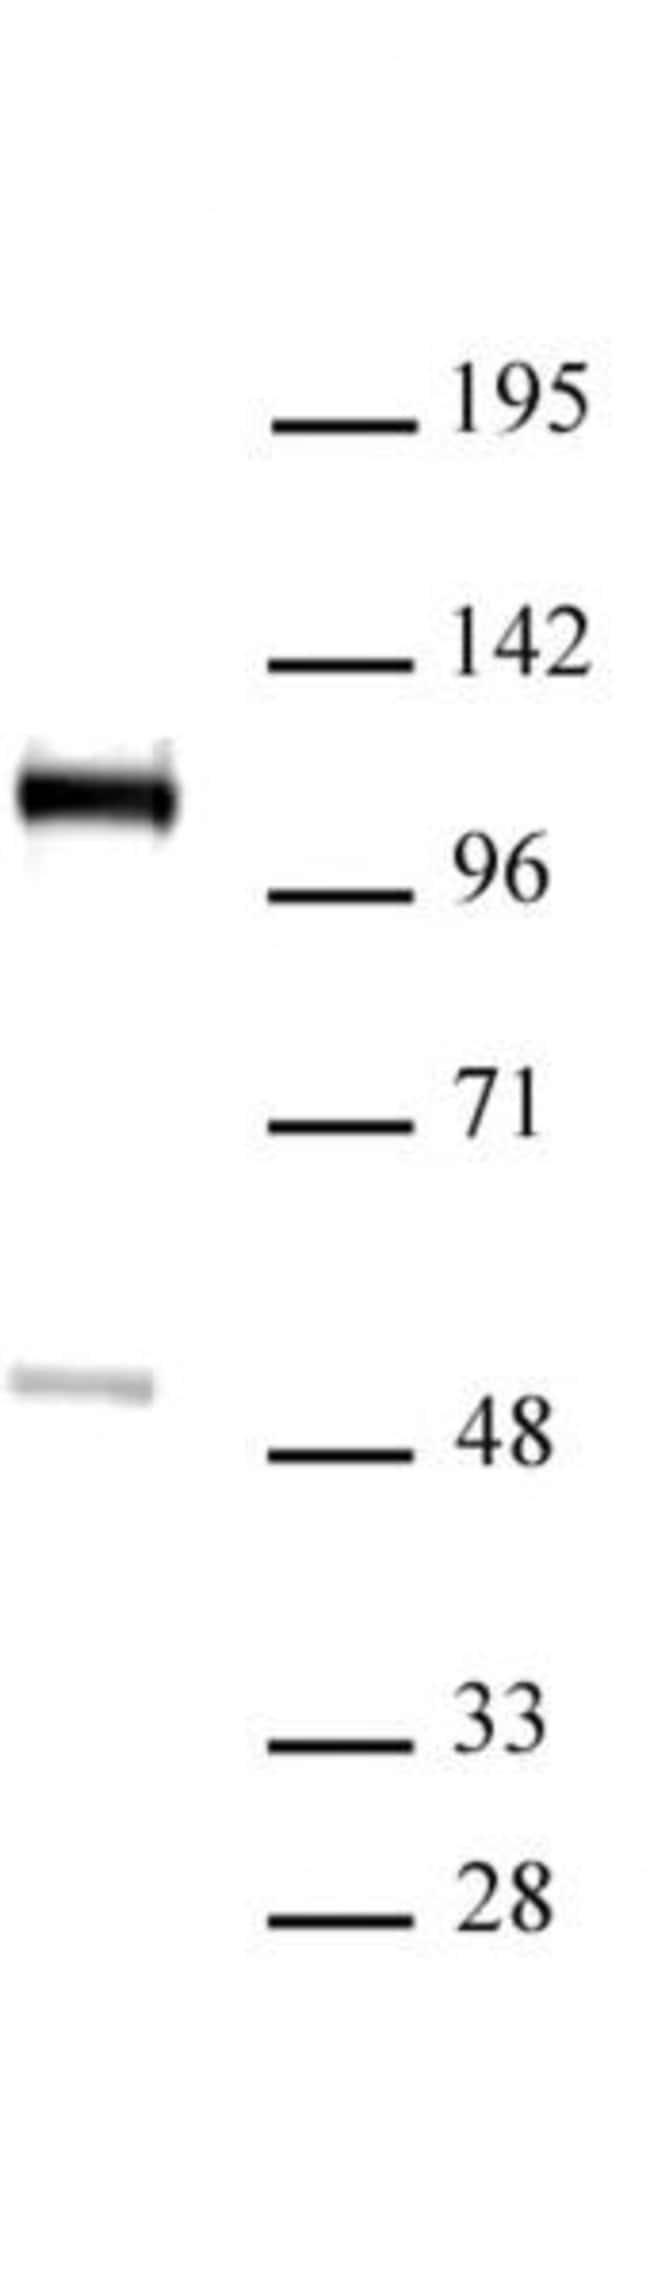 FOXM1 Rabbit anti-Human, Unconjugated, Polyclonal, Active Motif:Antibodies:Primary